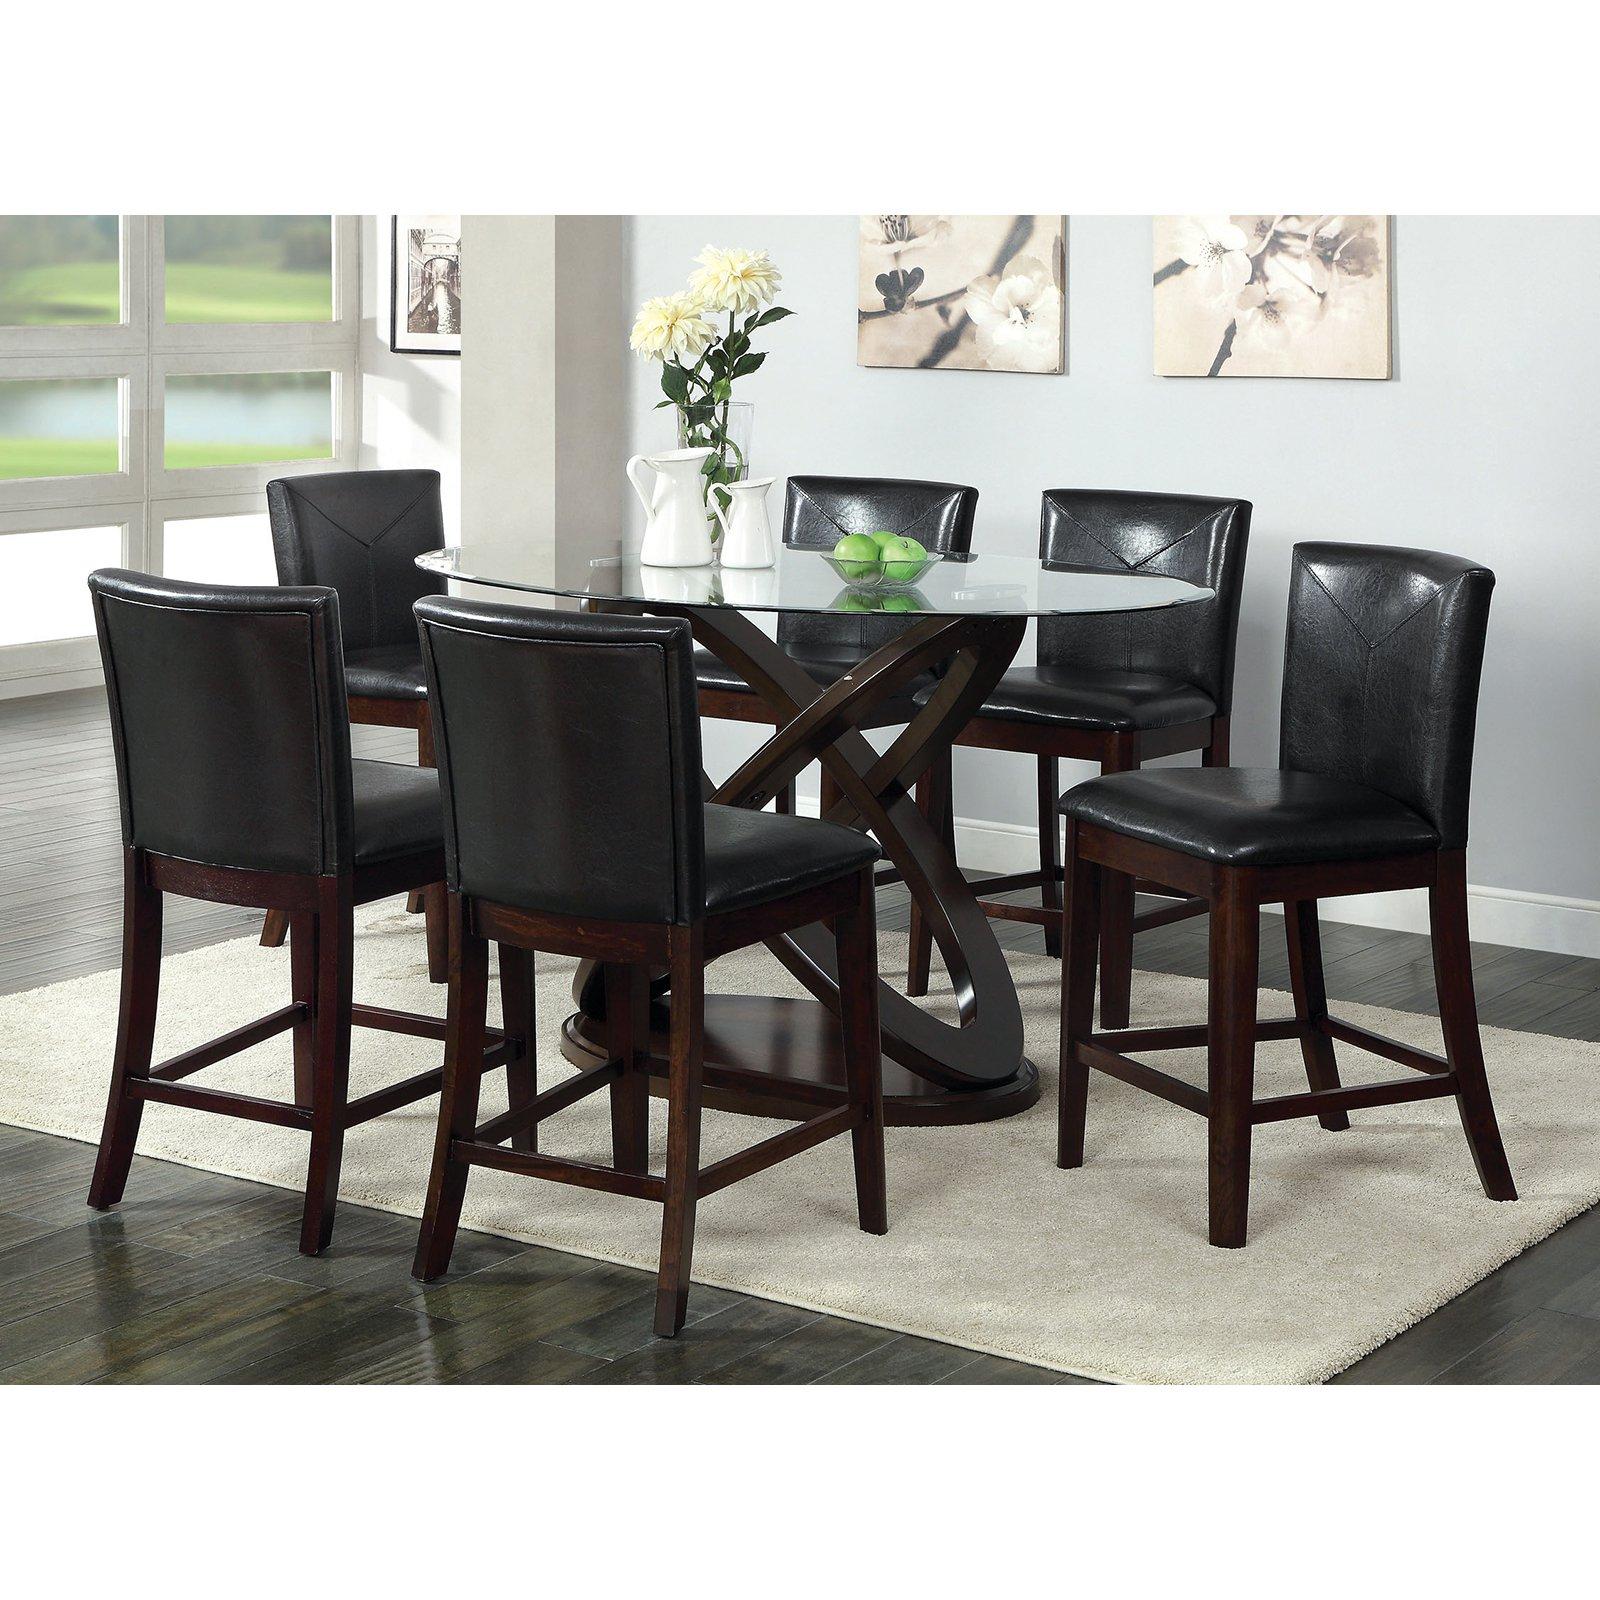 Furniture of America Ollivander 7-Piece Counter Height Glass Top ...